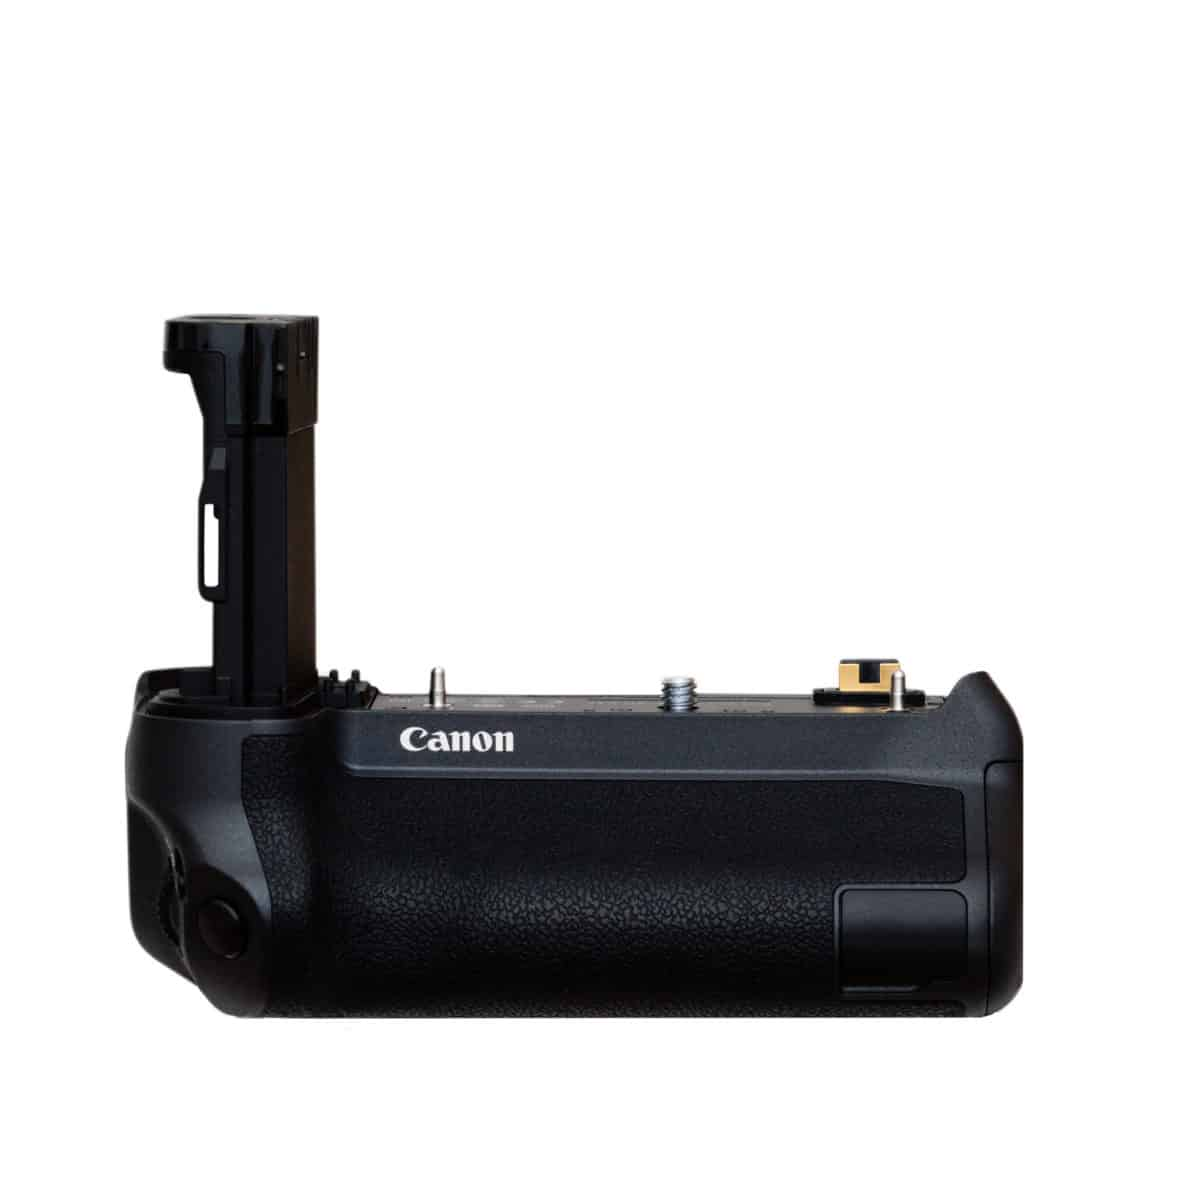 Den Canon Batteriegriff BG-E22 für Canon EOS R mieten ab 2,21 € am Tag.